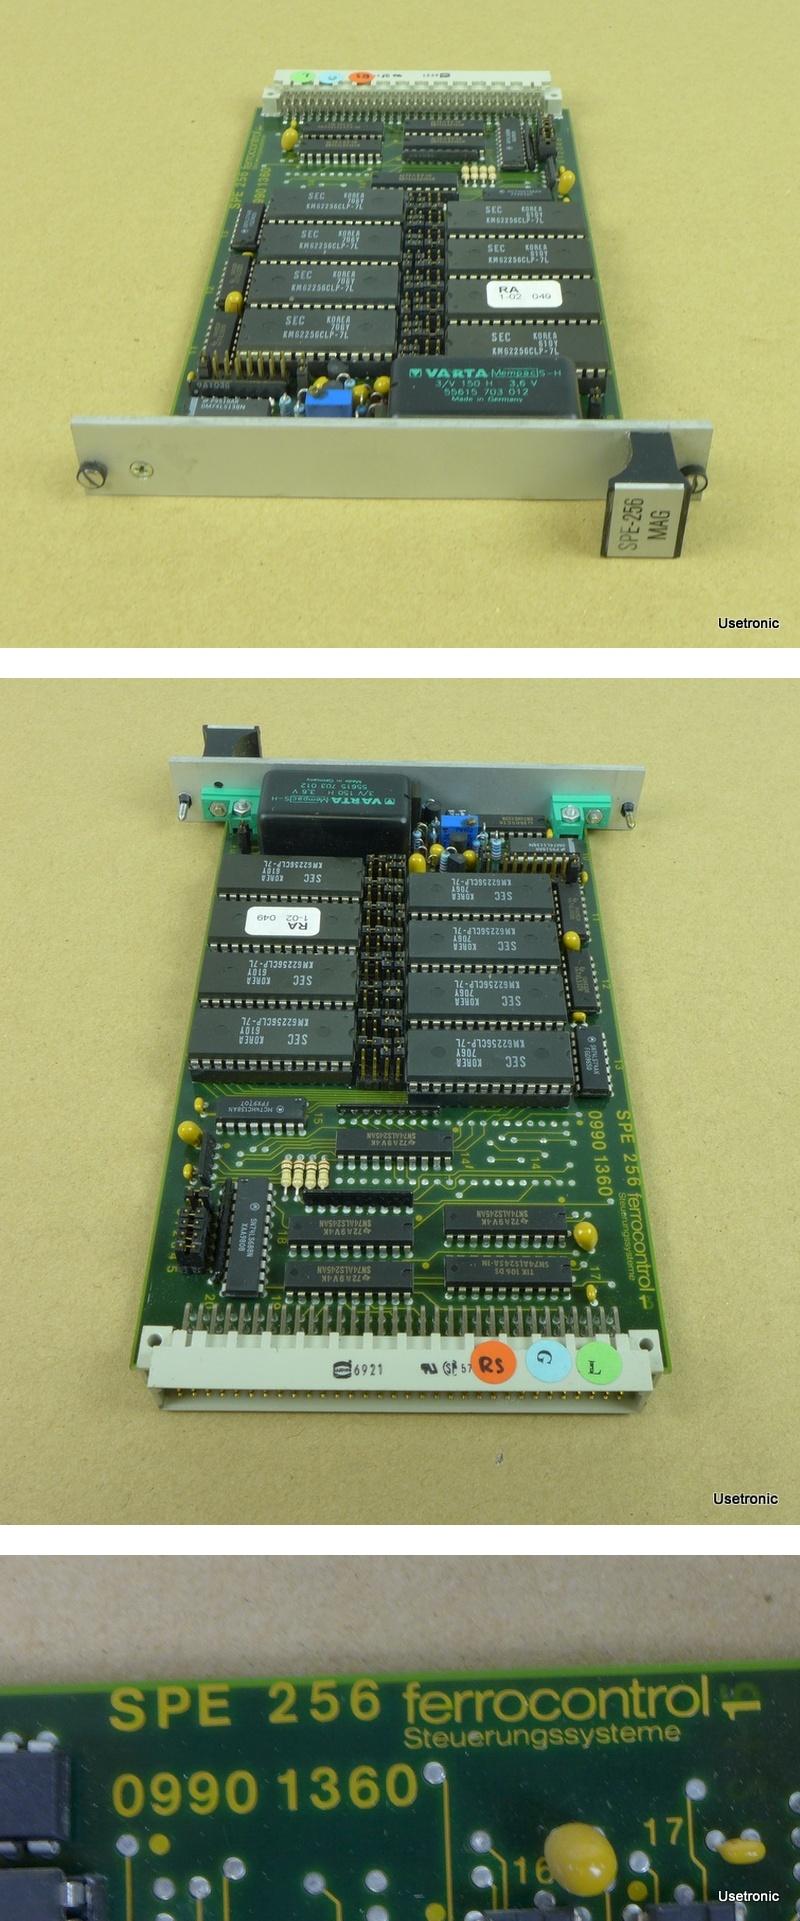 Ferrorcontrol SPE 256 MAG 09901360